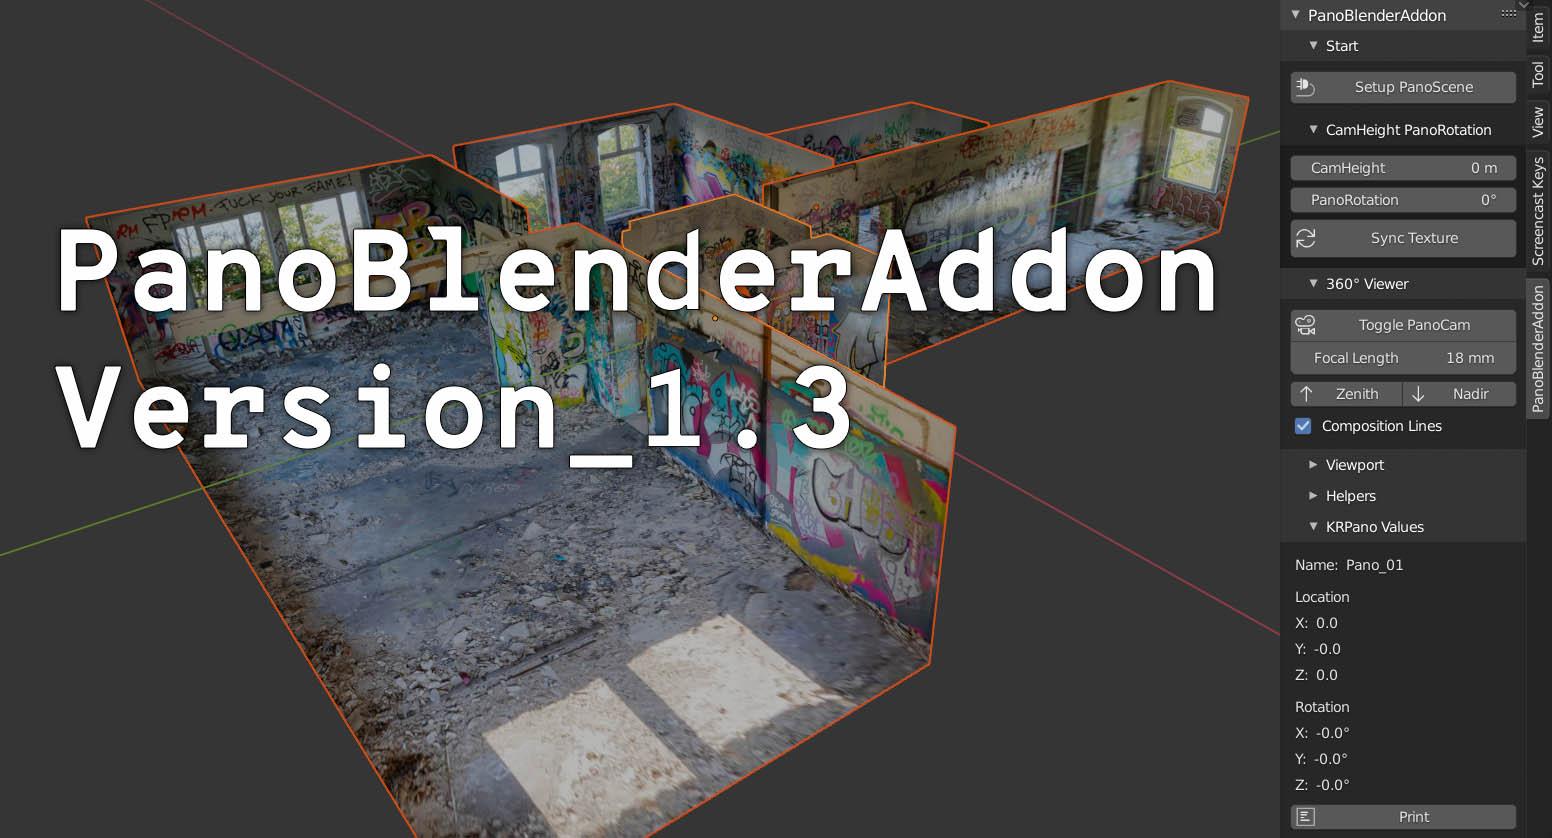 panoblenderaddon_1-3